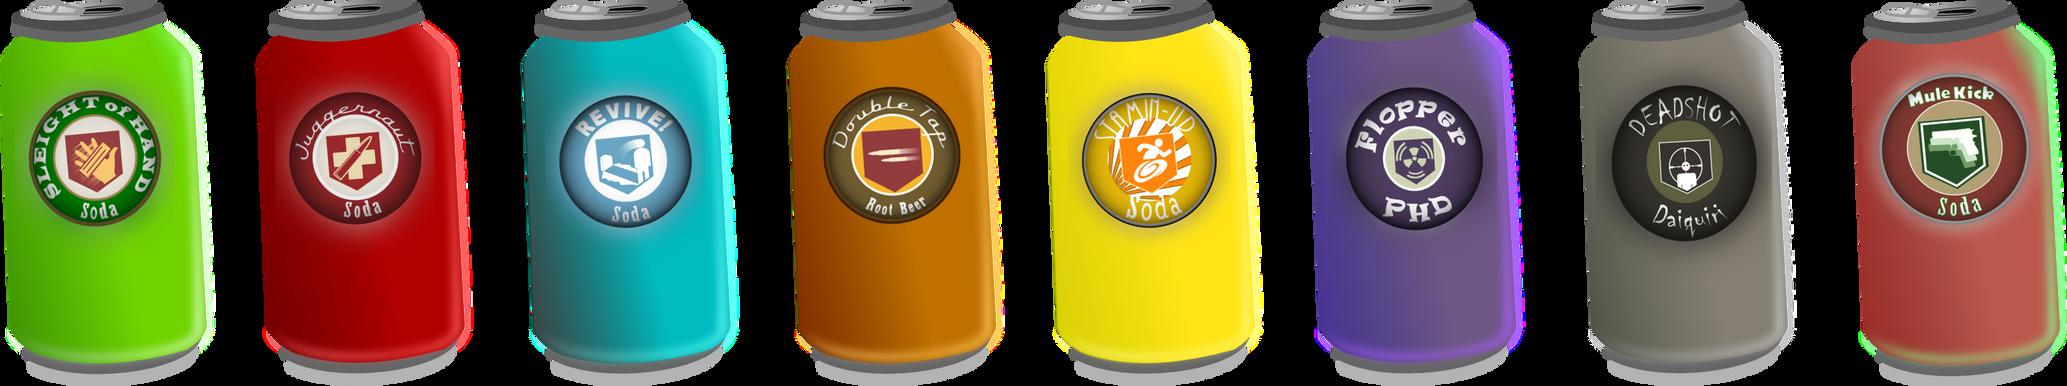 Canned Perk-a-C... Juggernog Soda Label